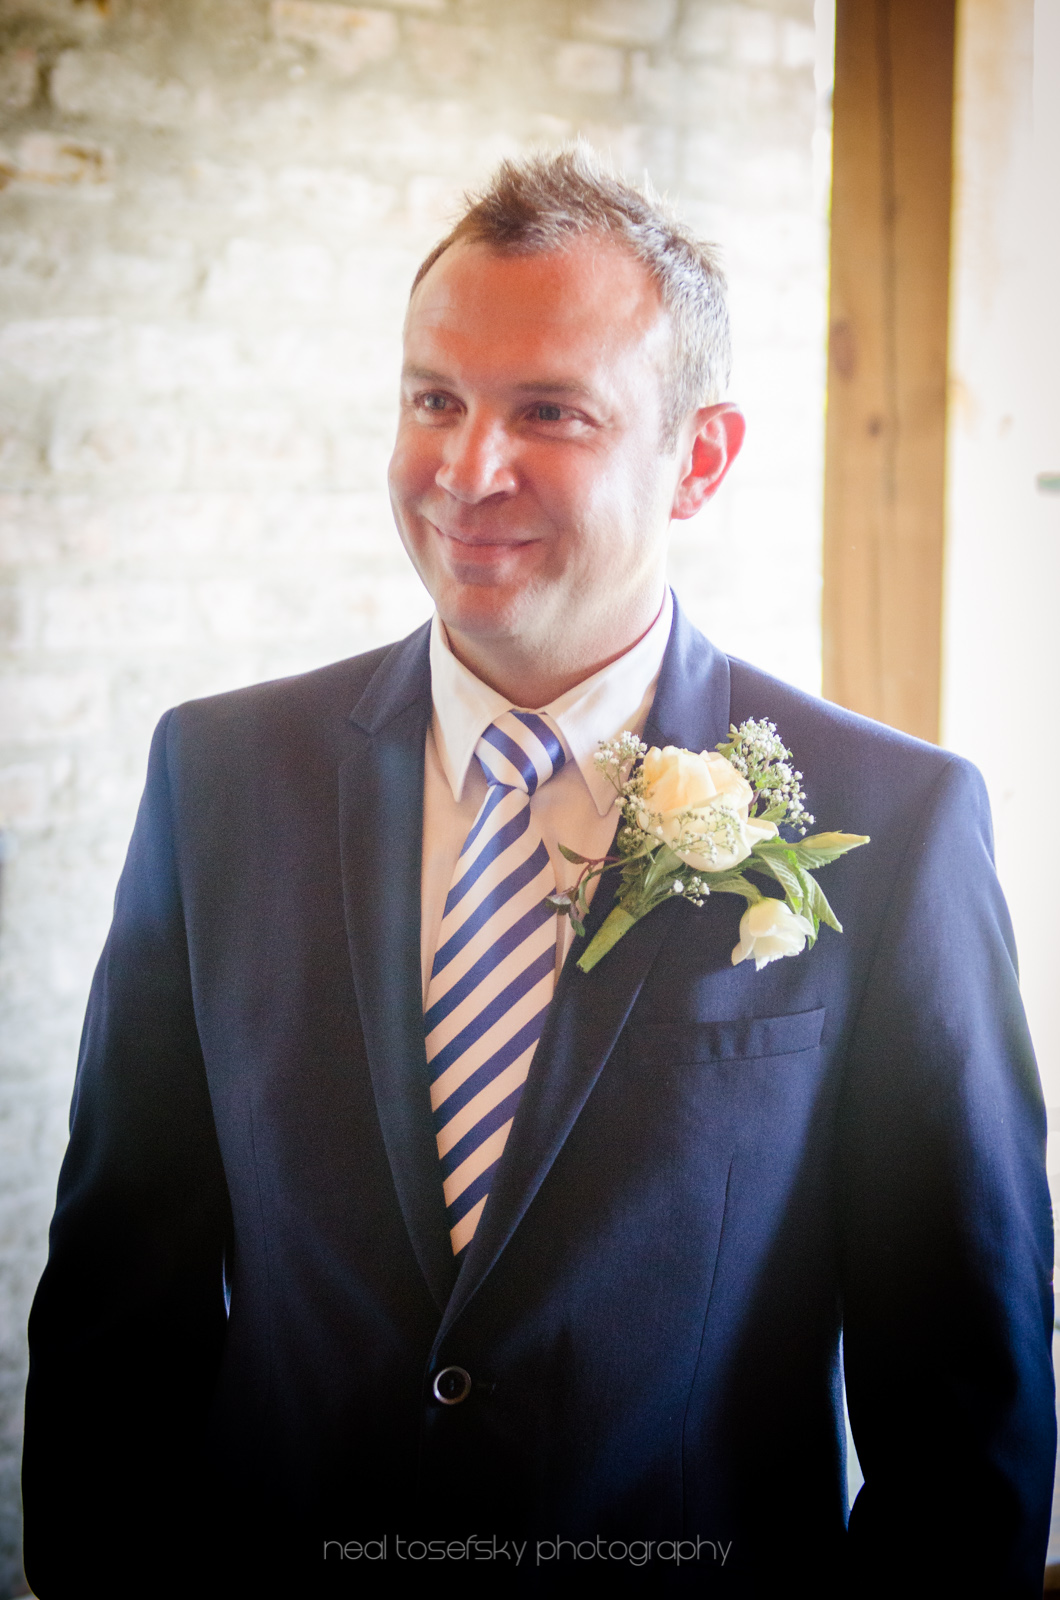 Jacky-and-Darryl-wedding-10338